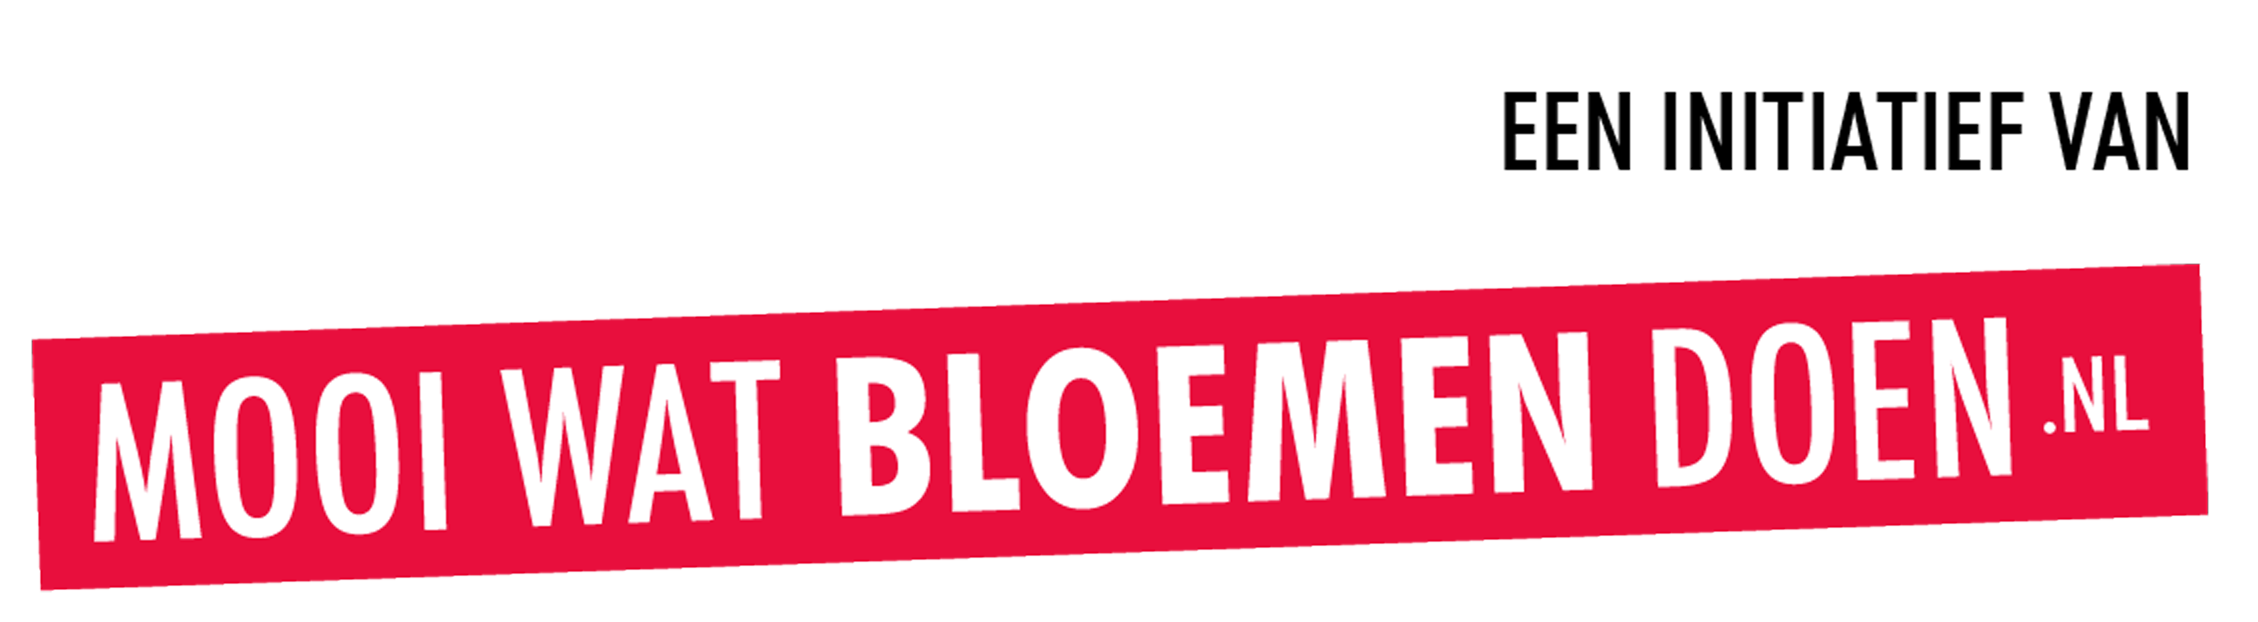 Bloom Bar mooi wat bloemen doen